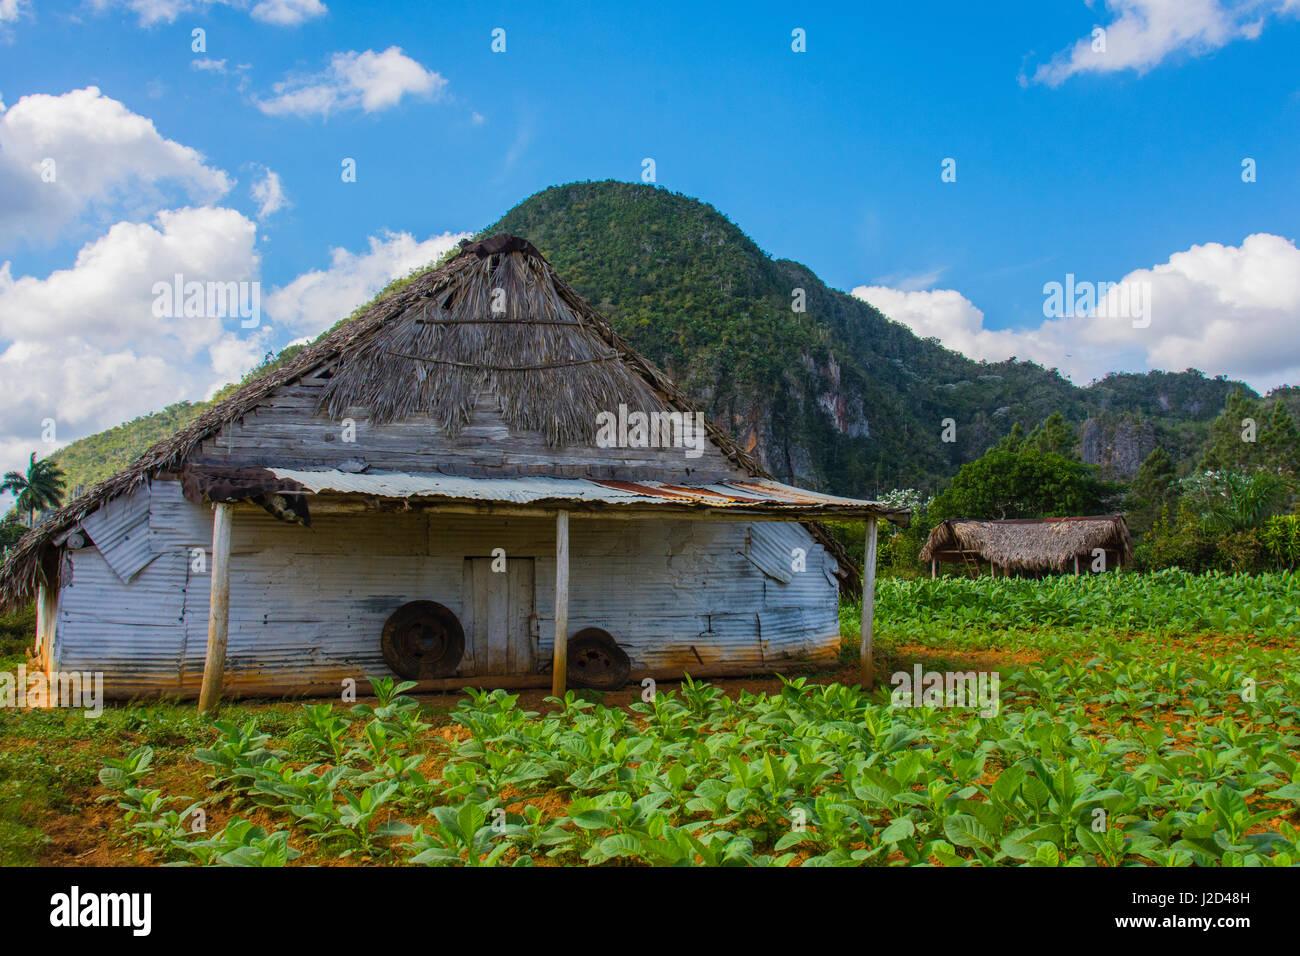 Cuba. Pinar del Rio. Vinales. Barn surrounded by tobacco fields. - Stock-Bilder